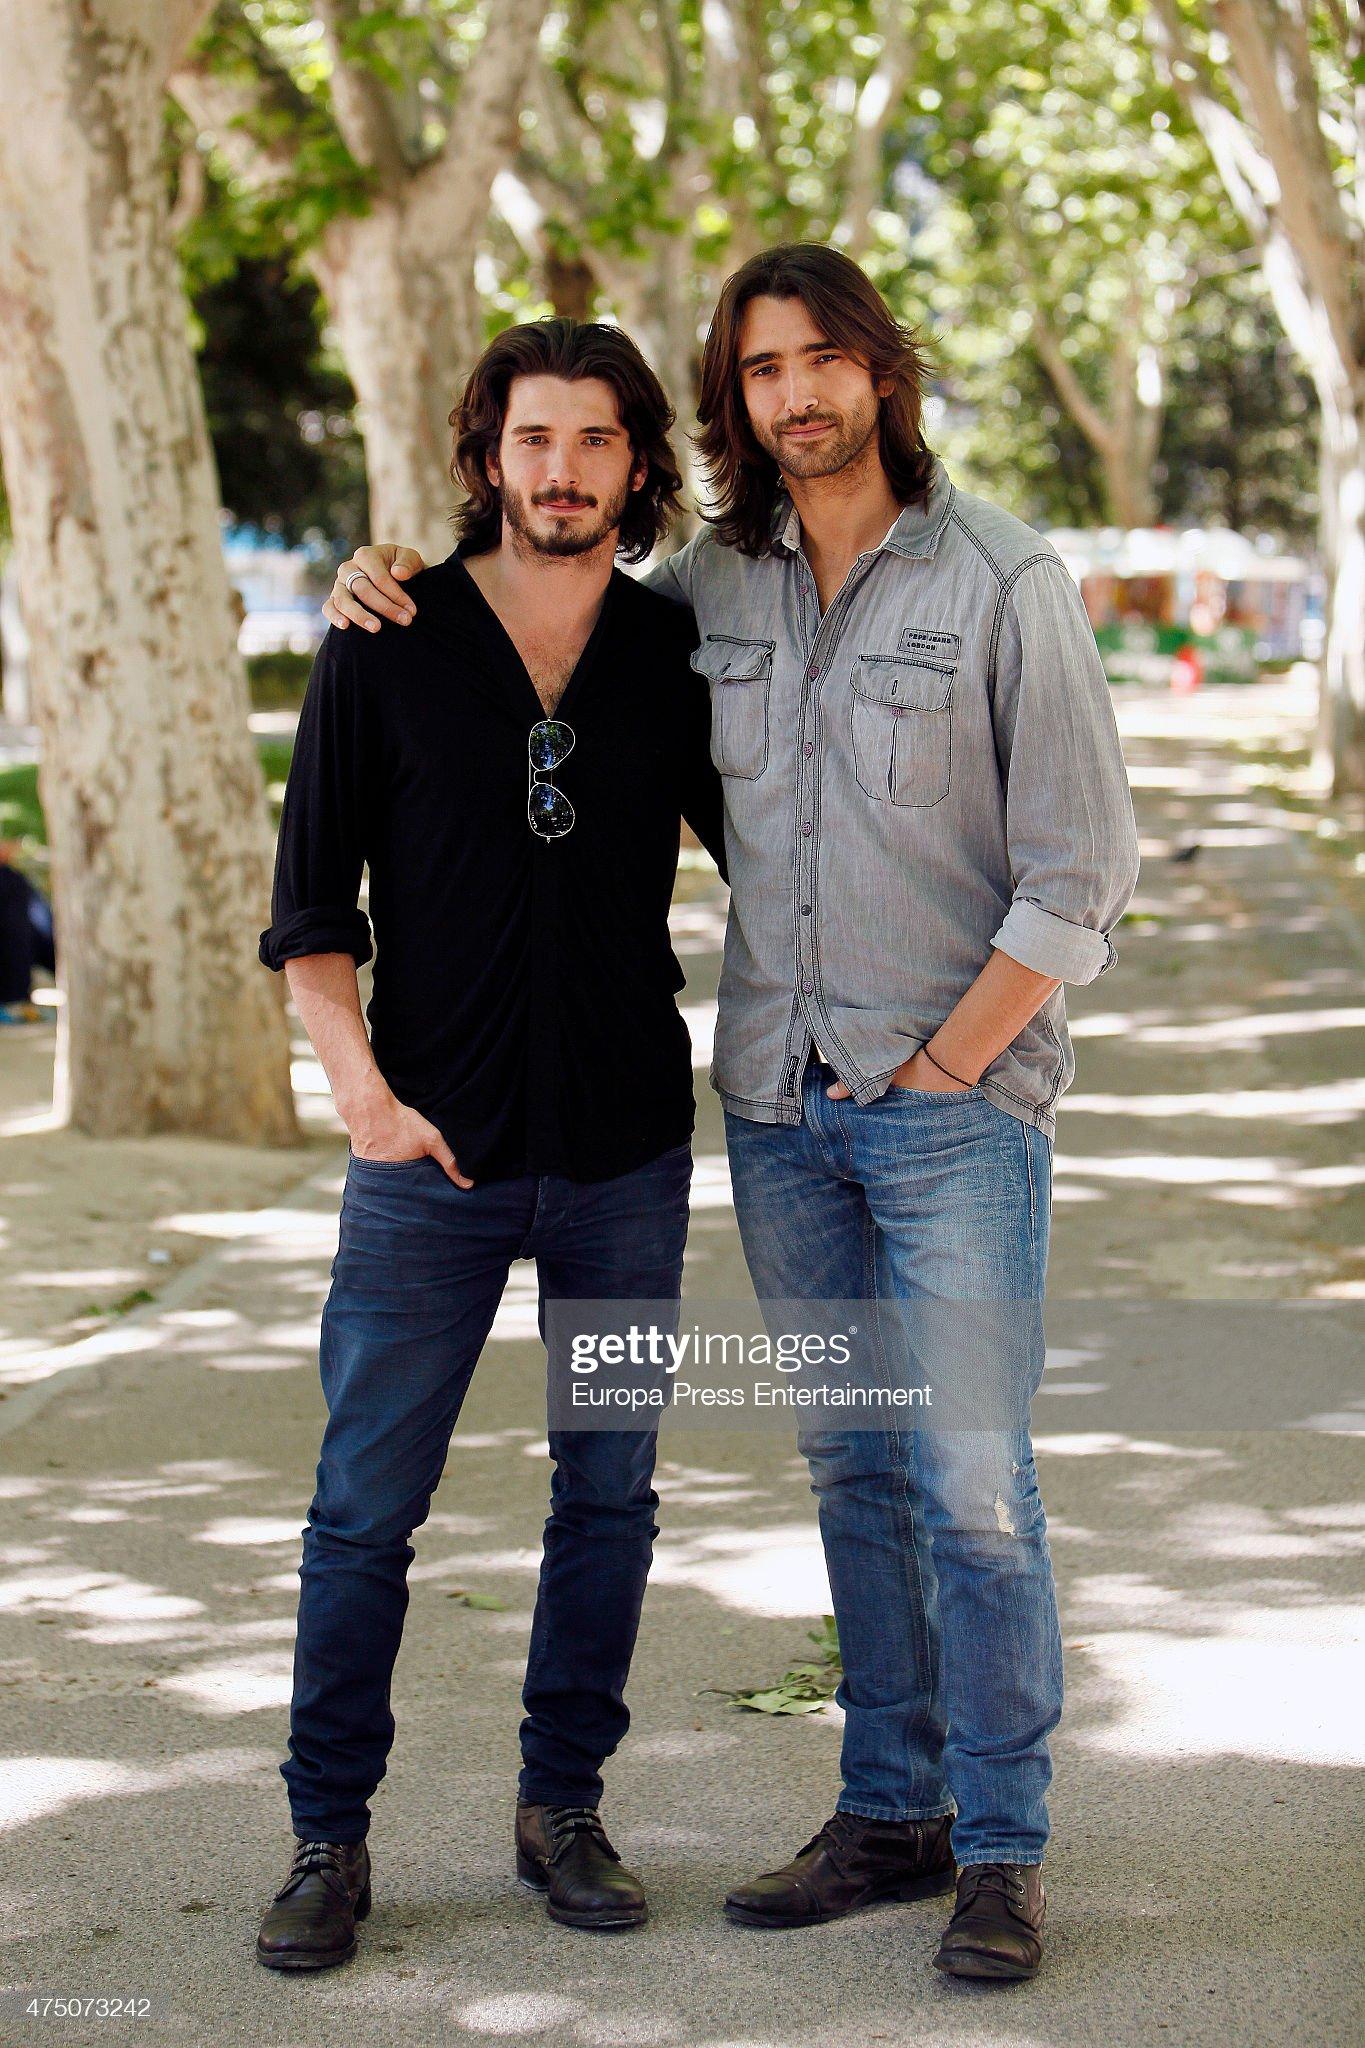 ¿Cuánto mide Yon González? - Altura Actor-aitor-luna-and-his-brother-yon-gonzalez-attend-matar-el-tiempo-picture-id475073242?s=2048x2048